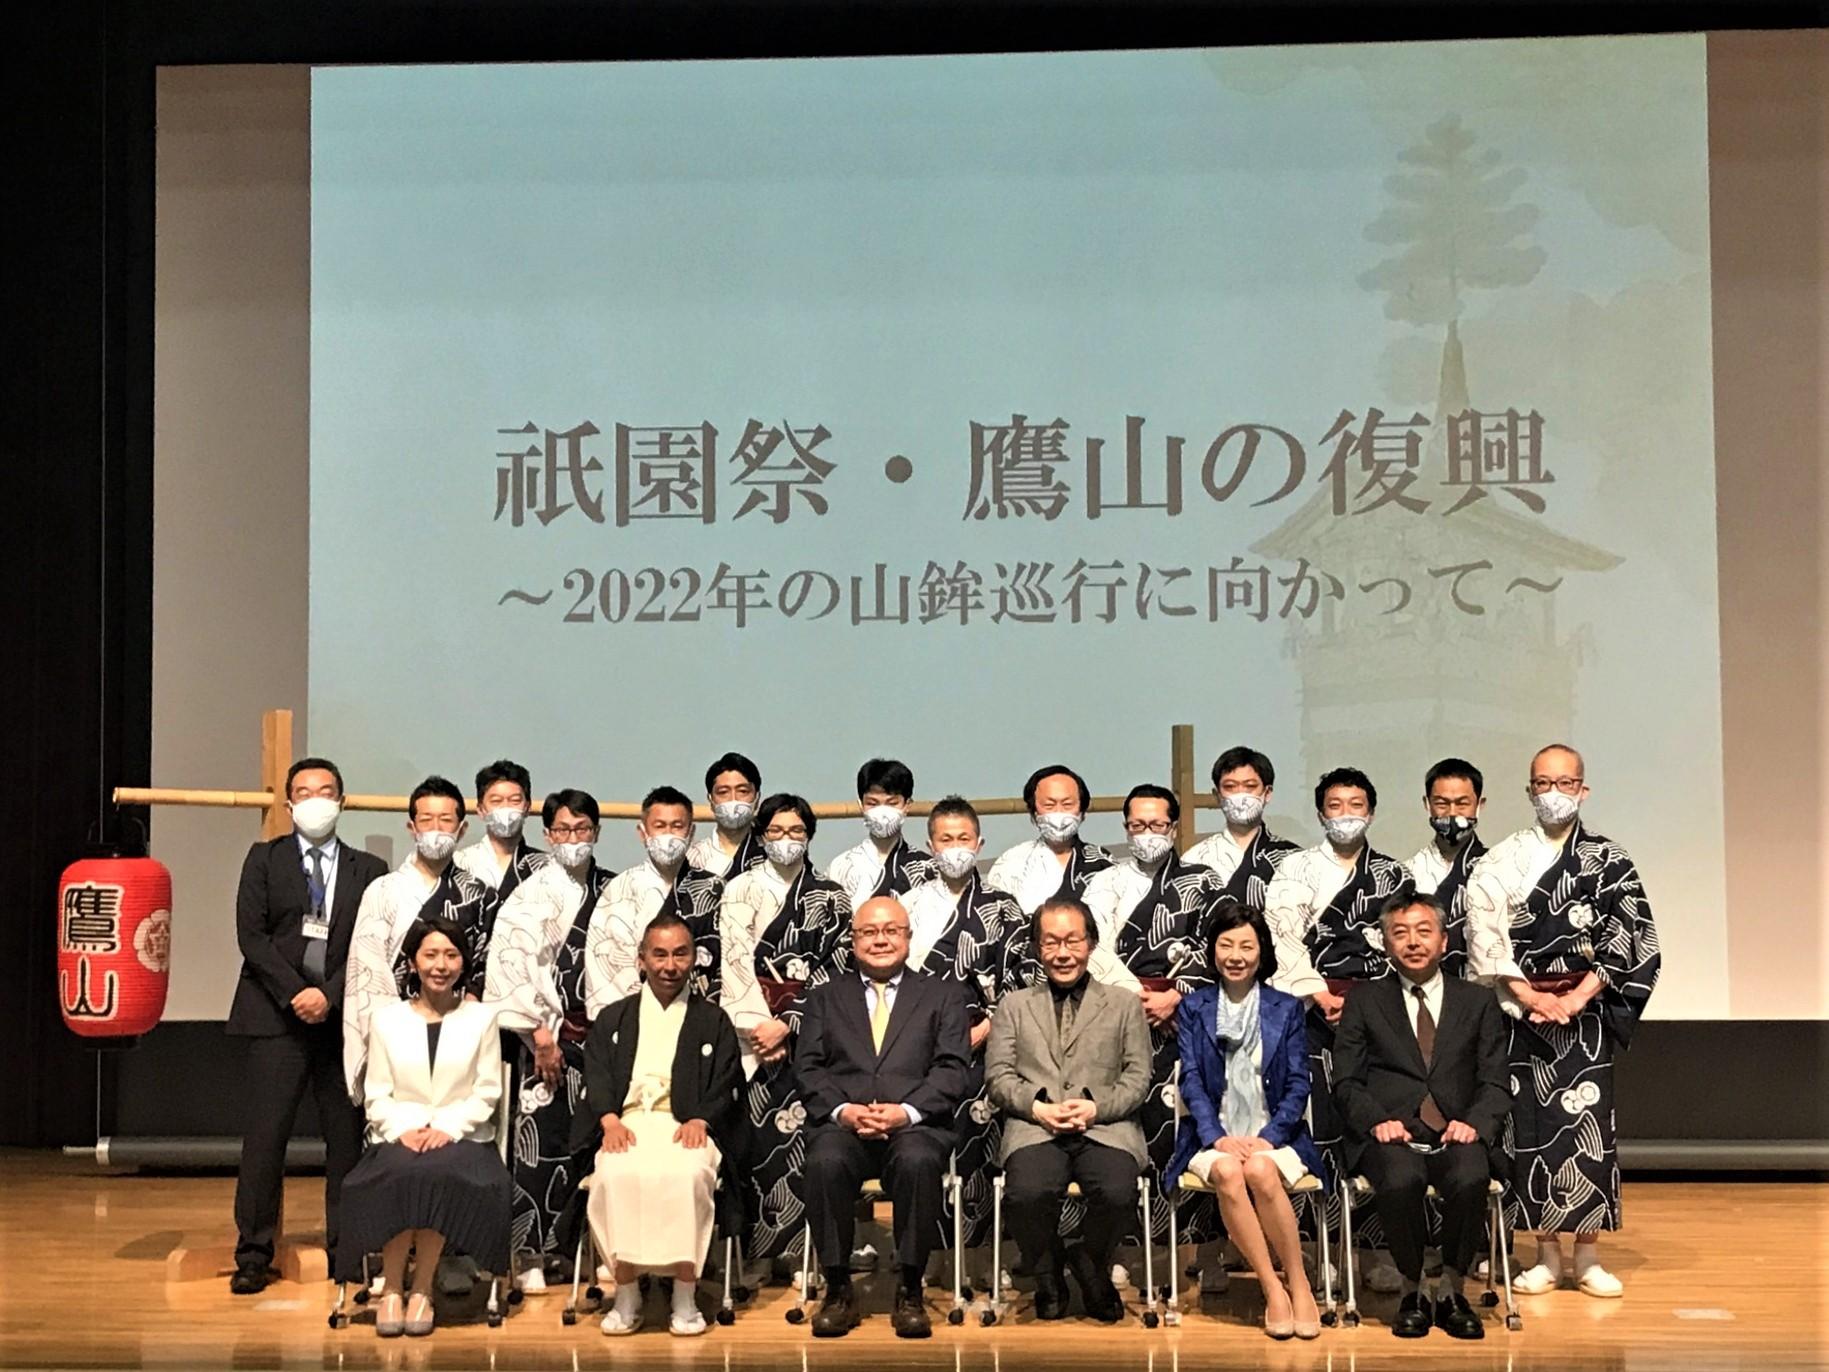 https://www.arc.ritsumei.ac.jp/lib/app/newarc/news/imageedit_6_5663237401.jpg